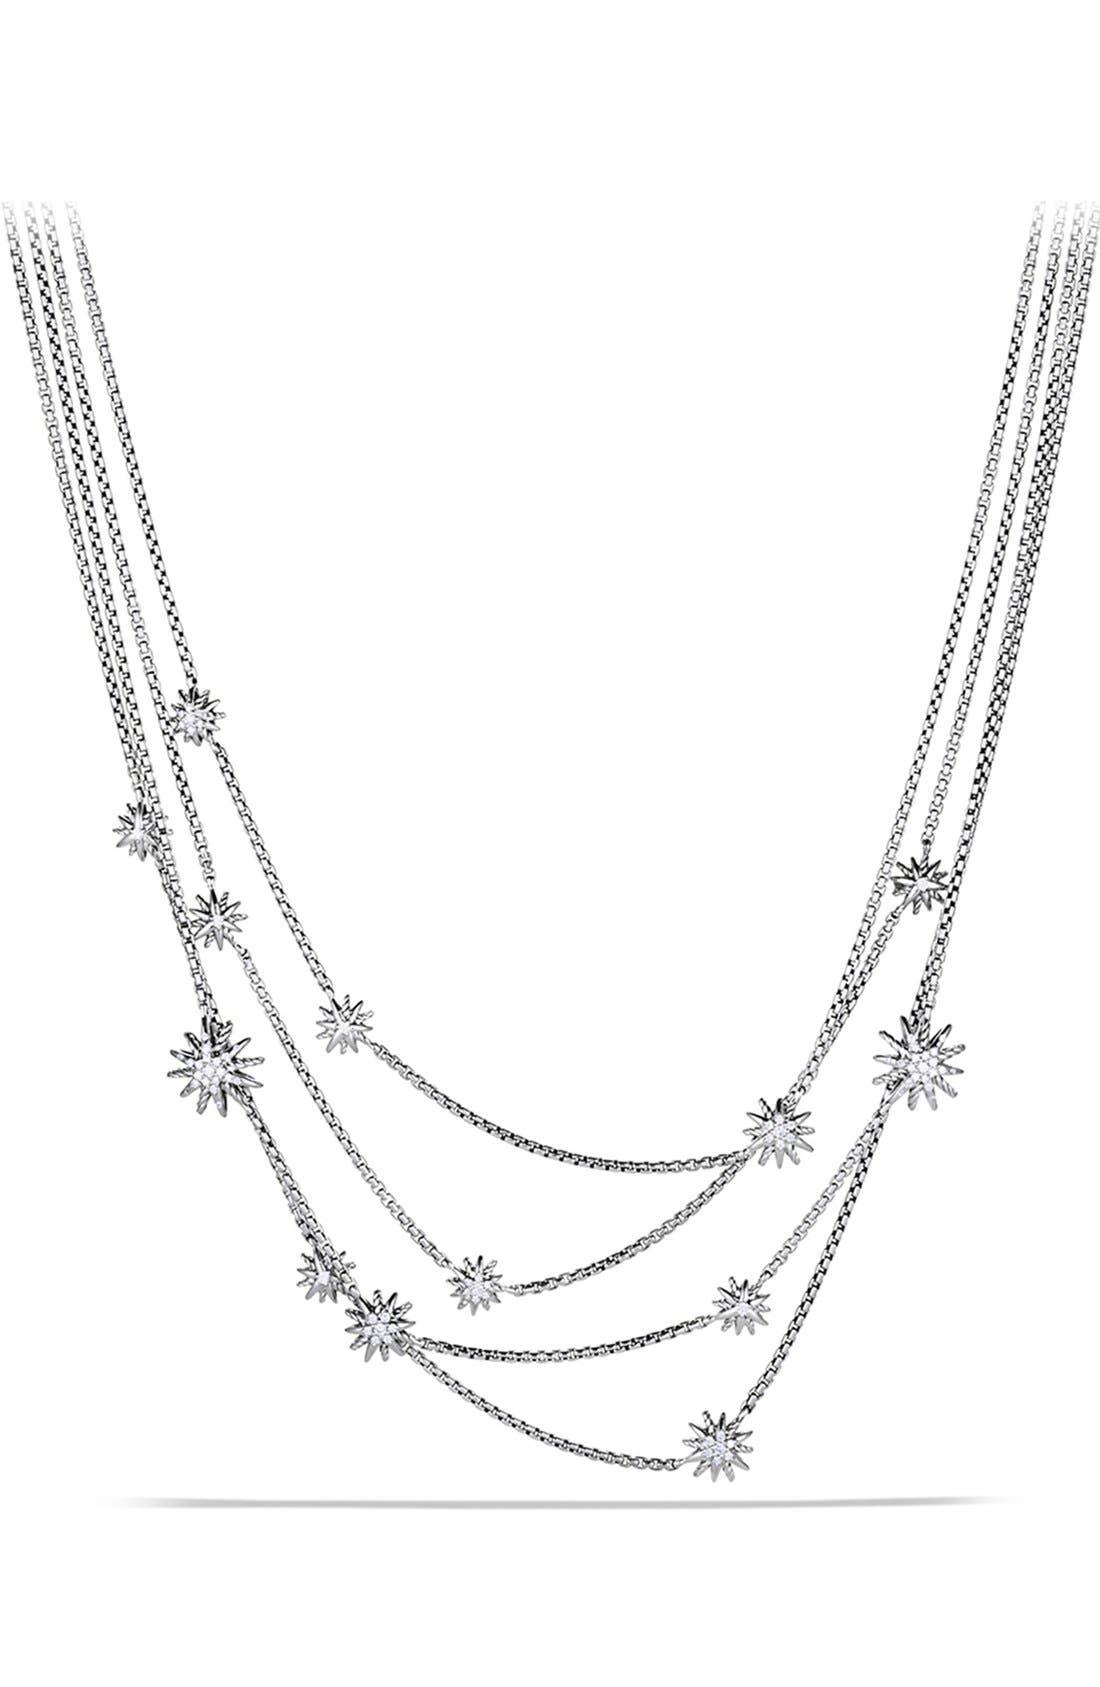 Alternate Image 1 Selected - David Yurman 'Starburst' Chain Necklace with Diamonds